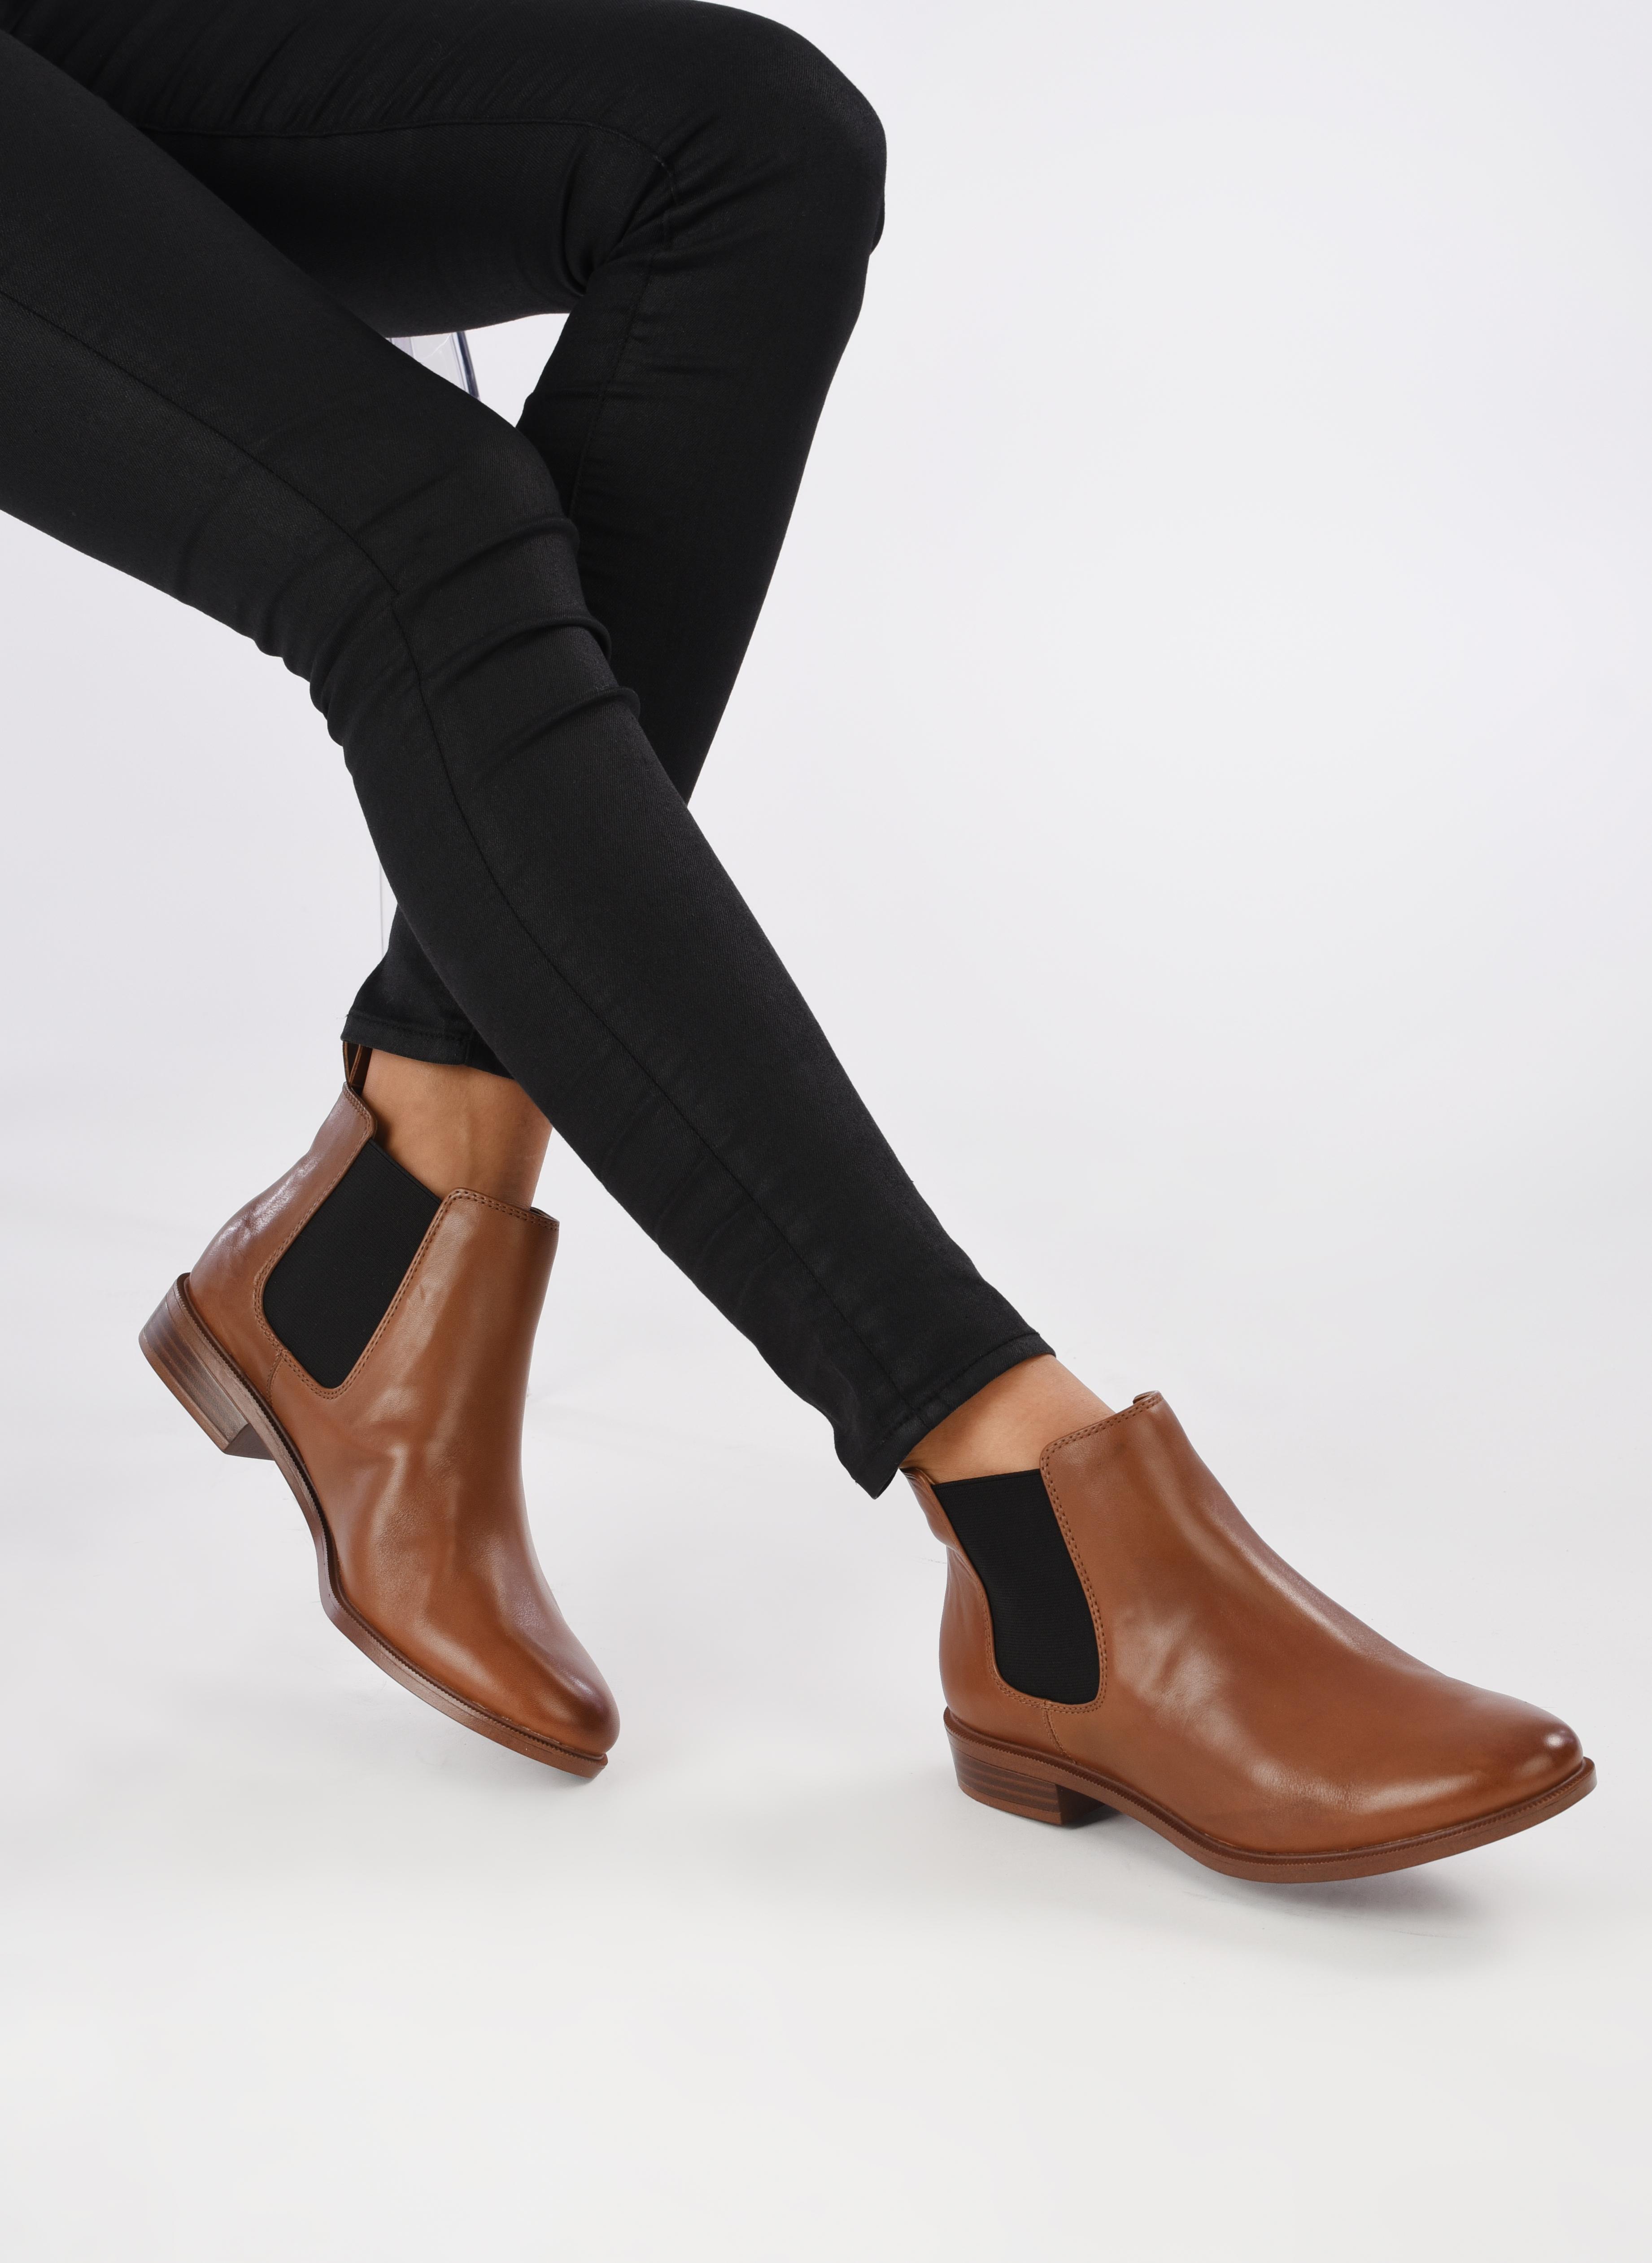 Taylor Shine Tan Leather